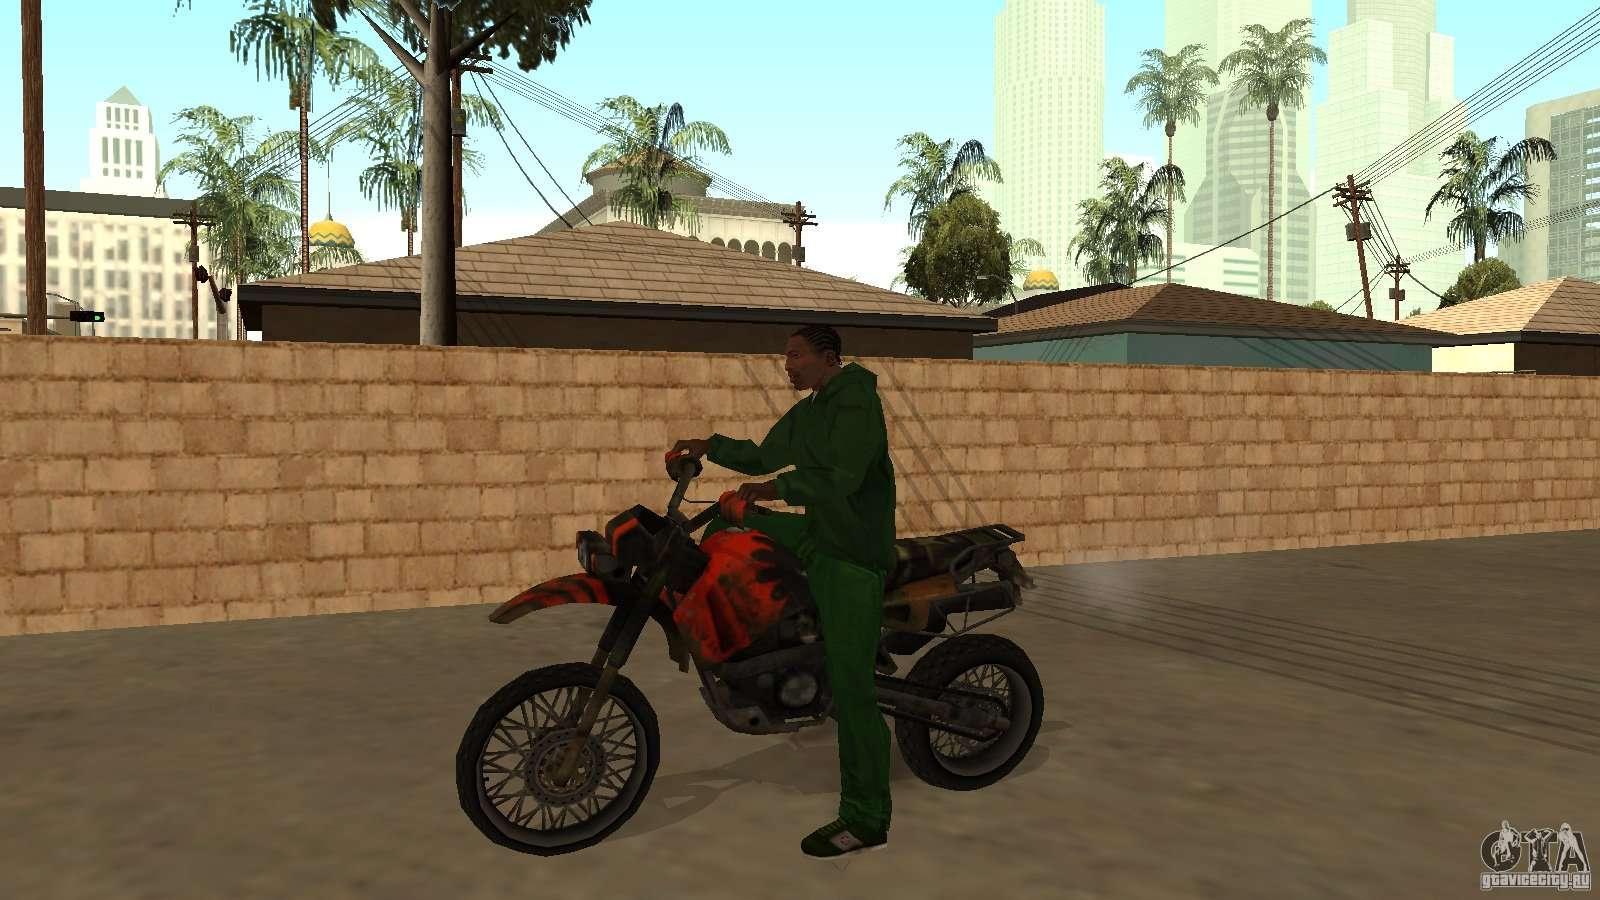 коды на гта санандрес на мотоциклы код